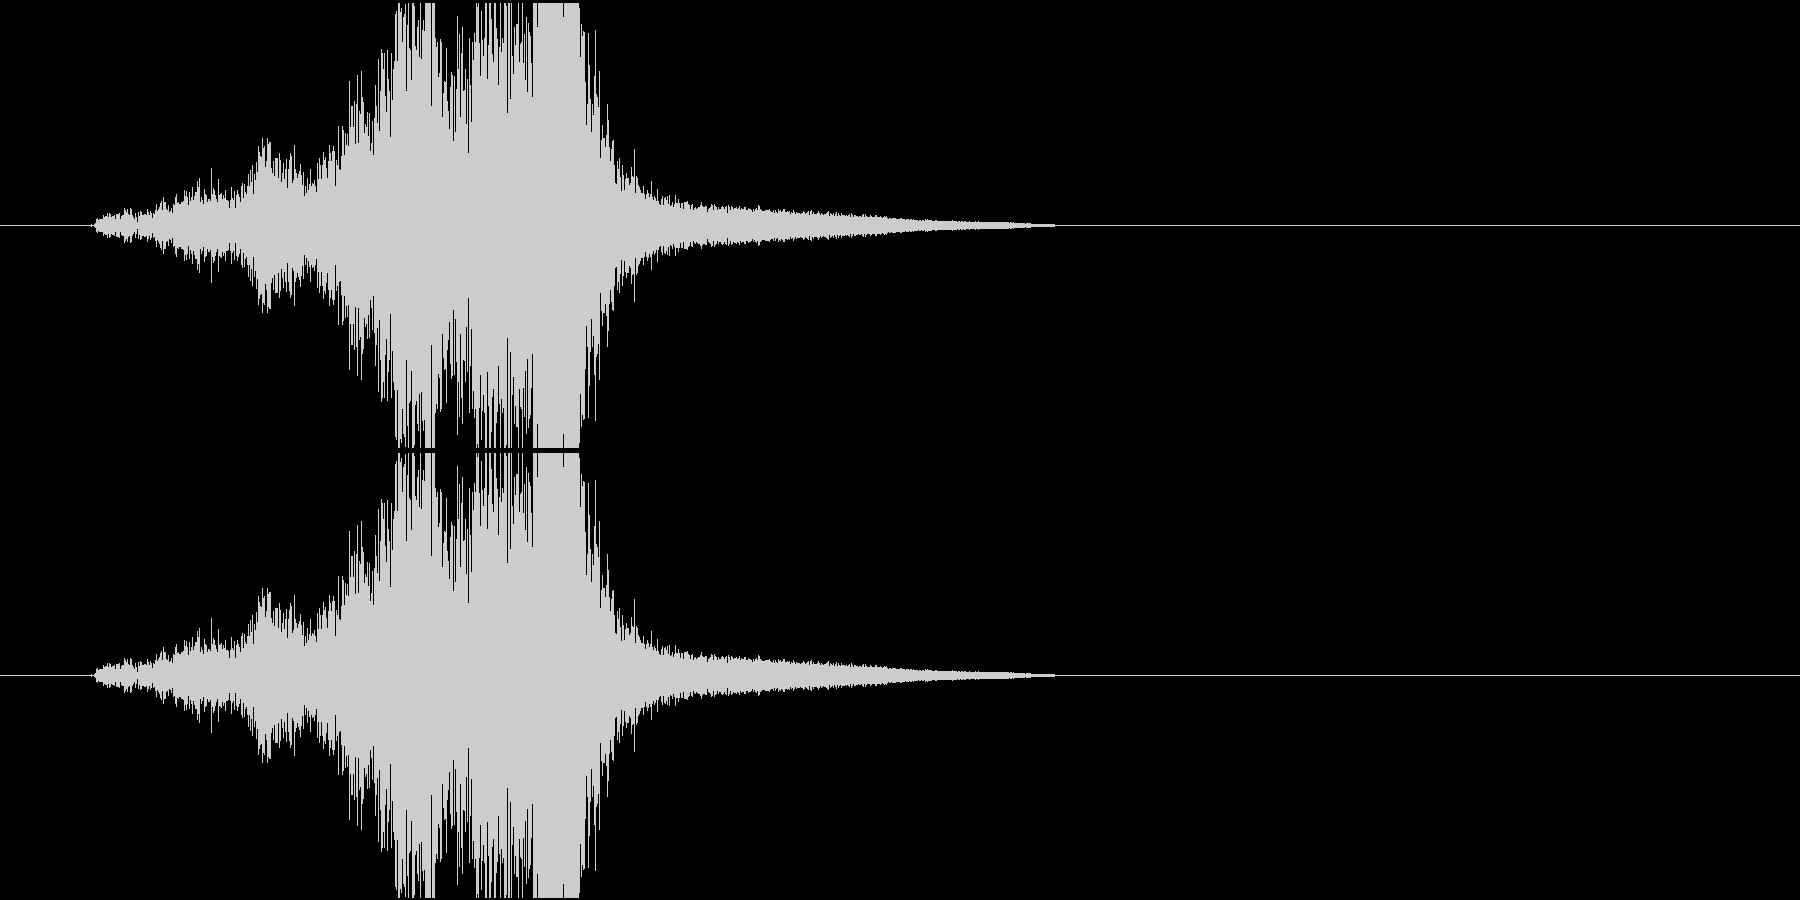 Katana 剣と剣が擦れ合う戦闘音の未再生の波形